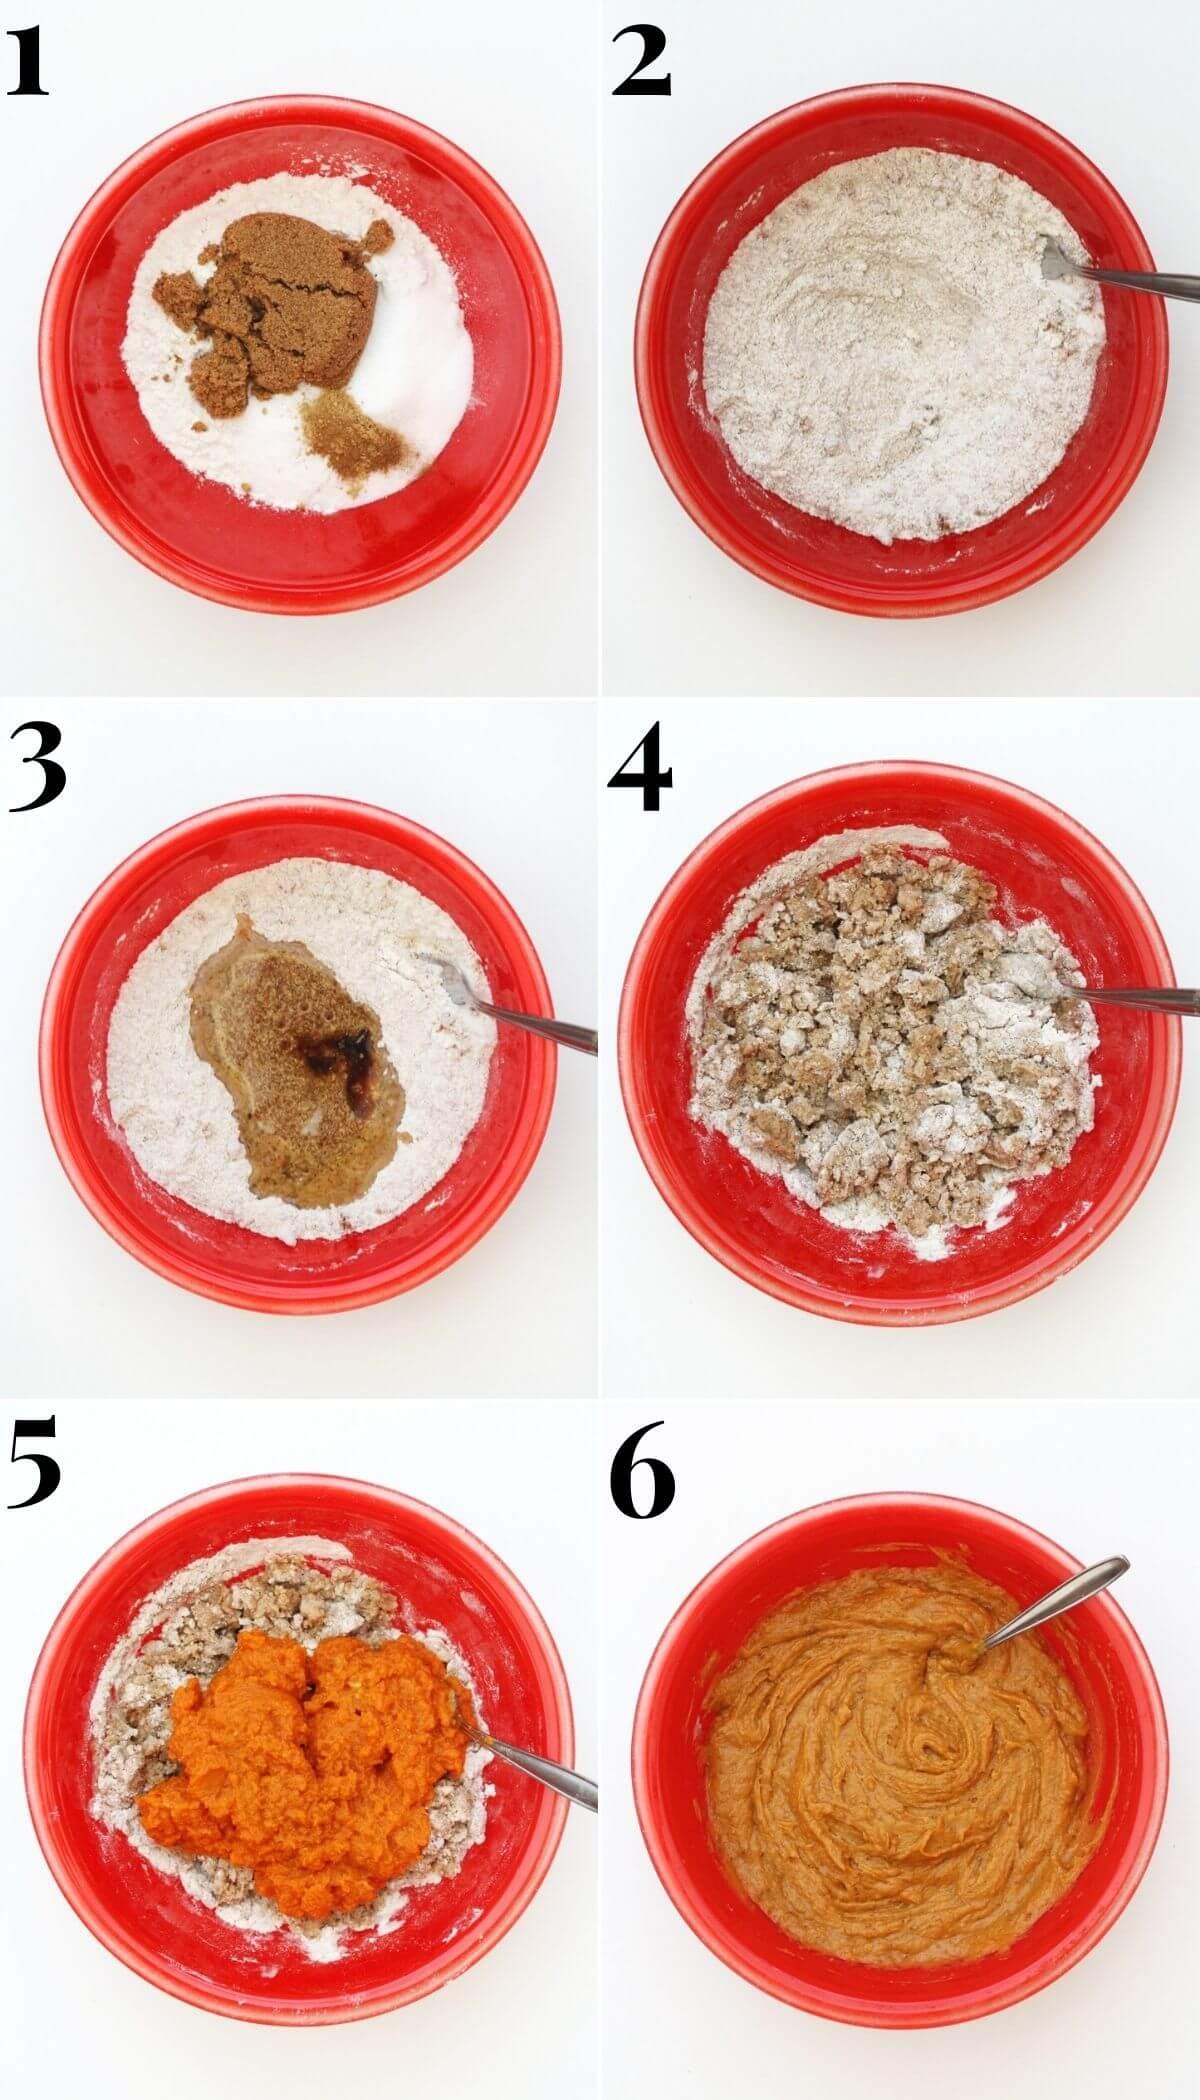 process steps for making gluten-free pumpkin cake batter